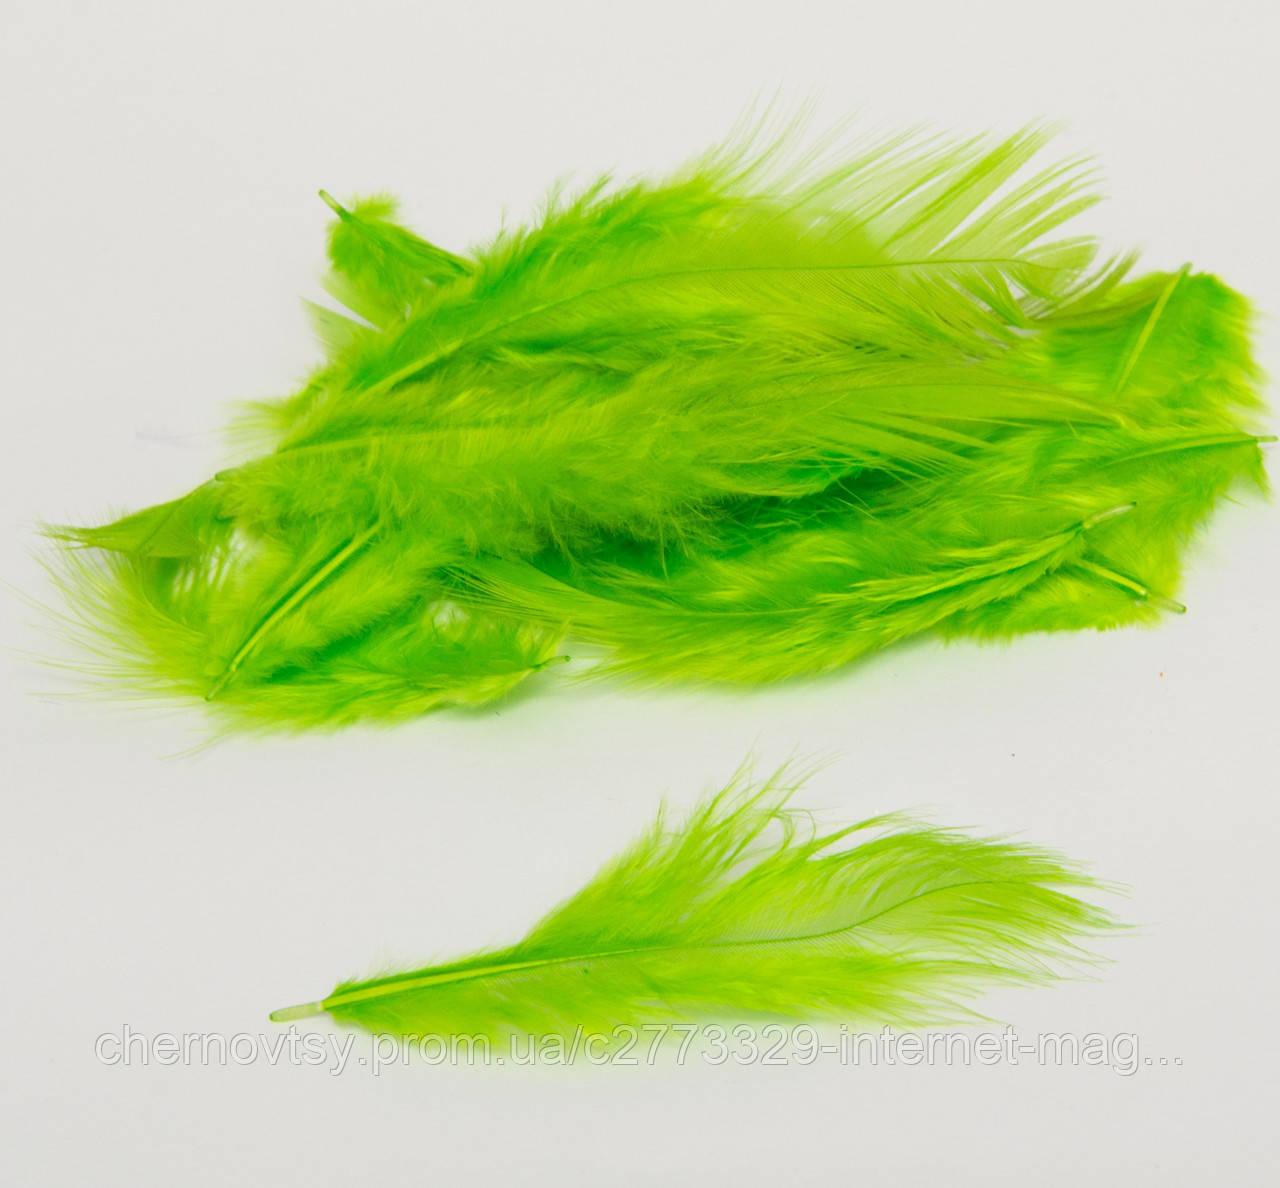 Перья цветные 100 шт. зеленые